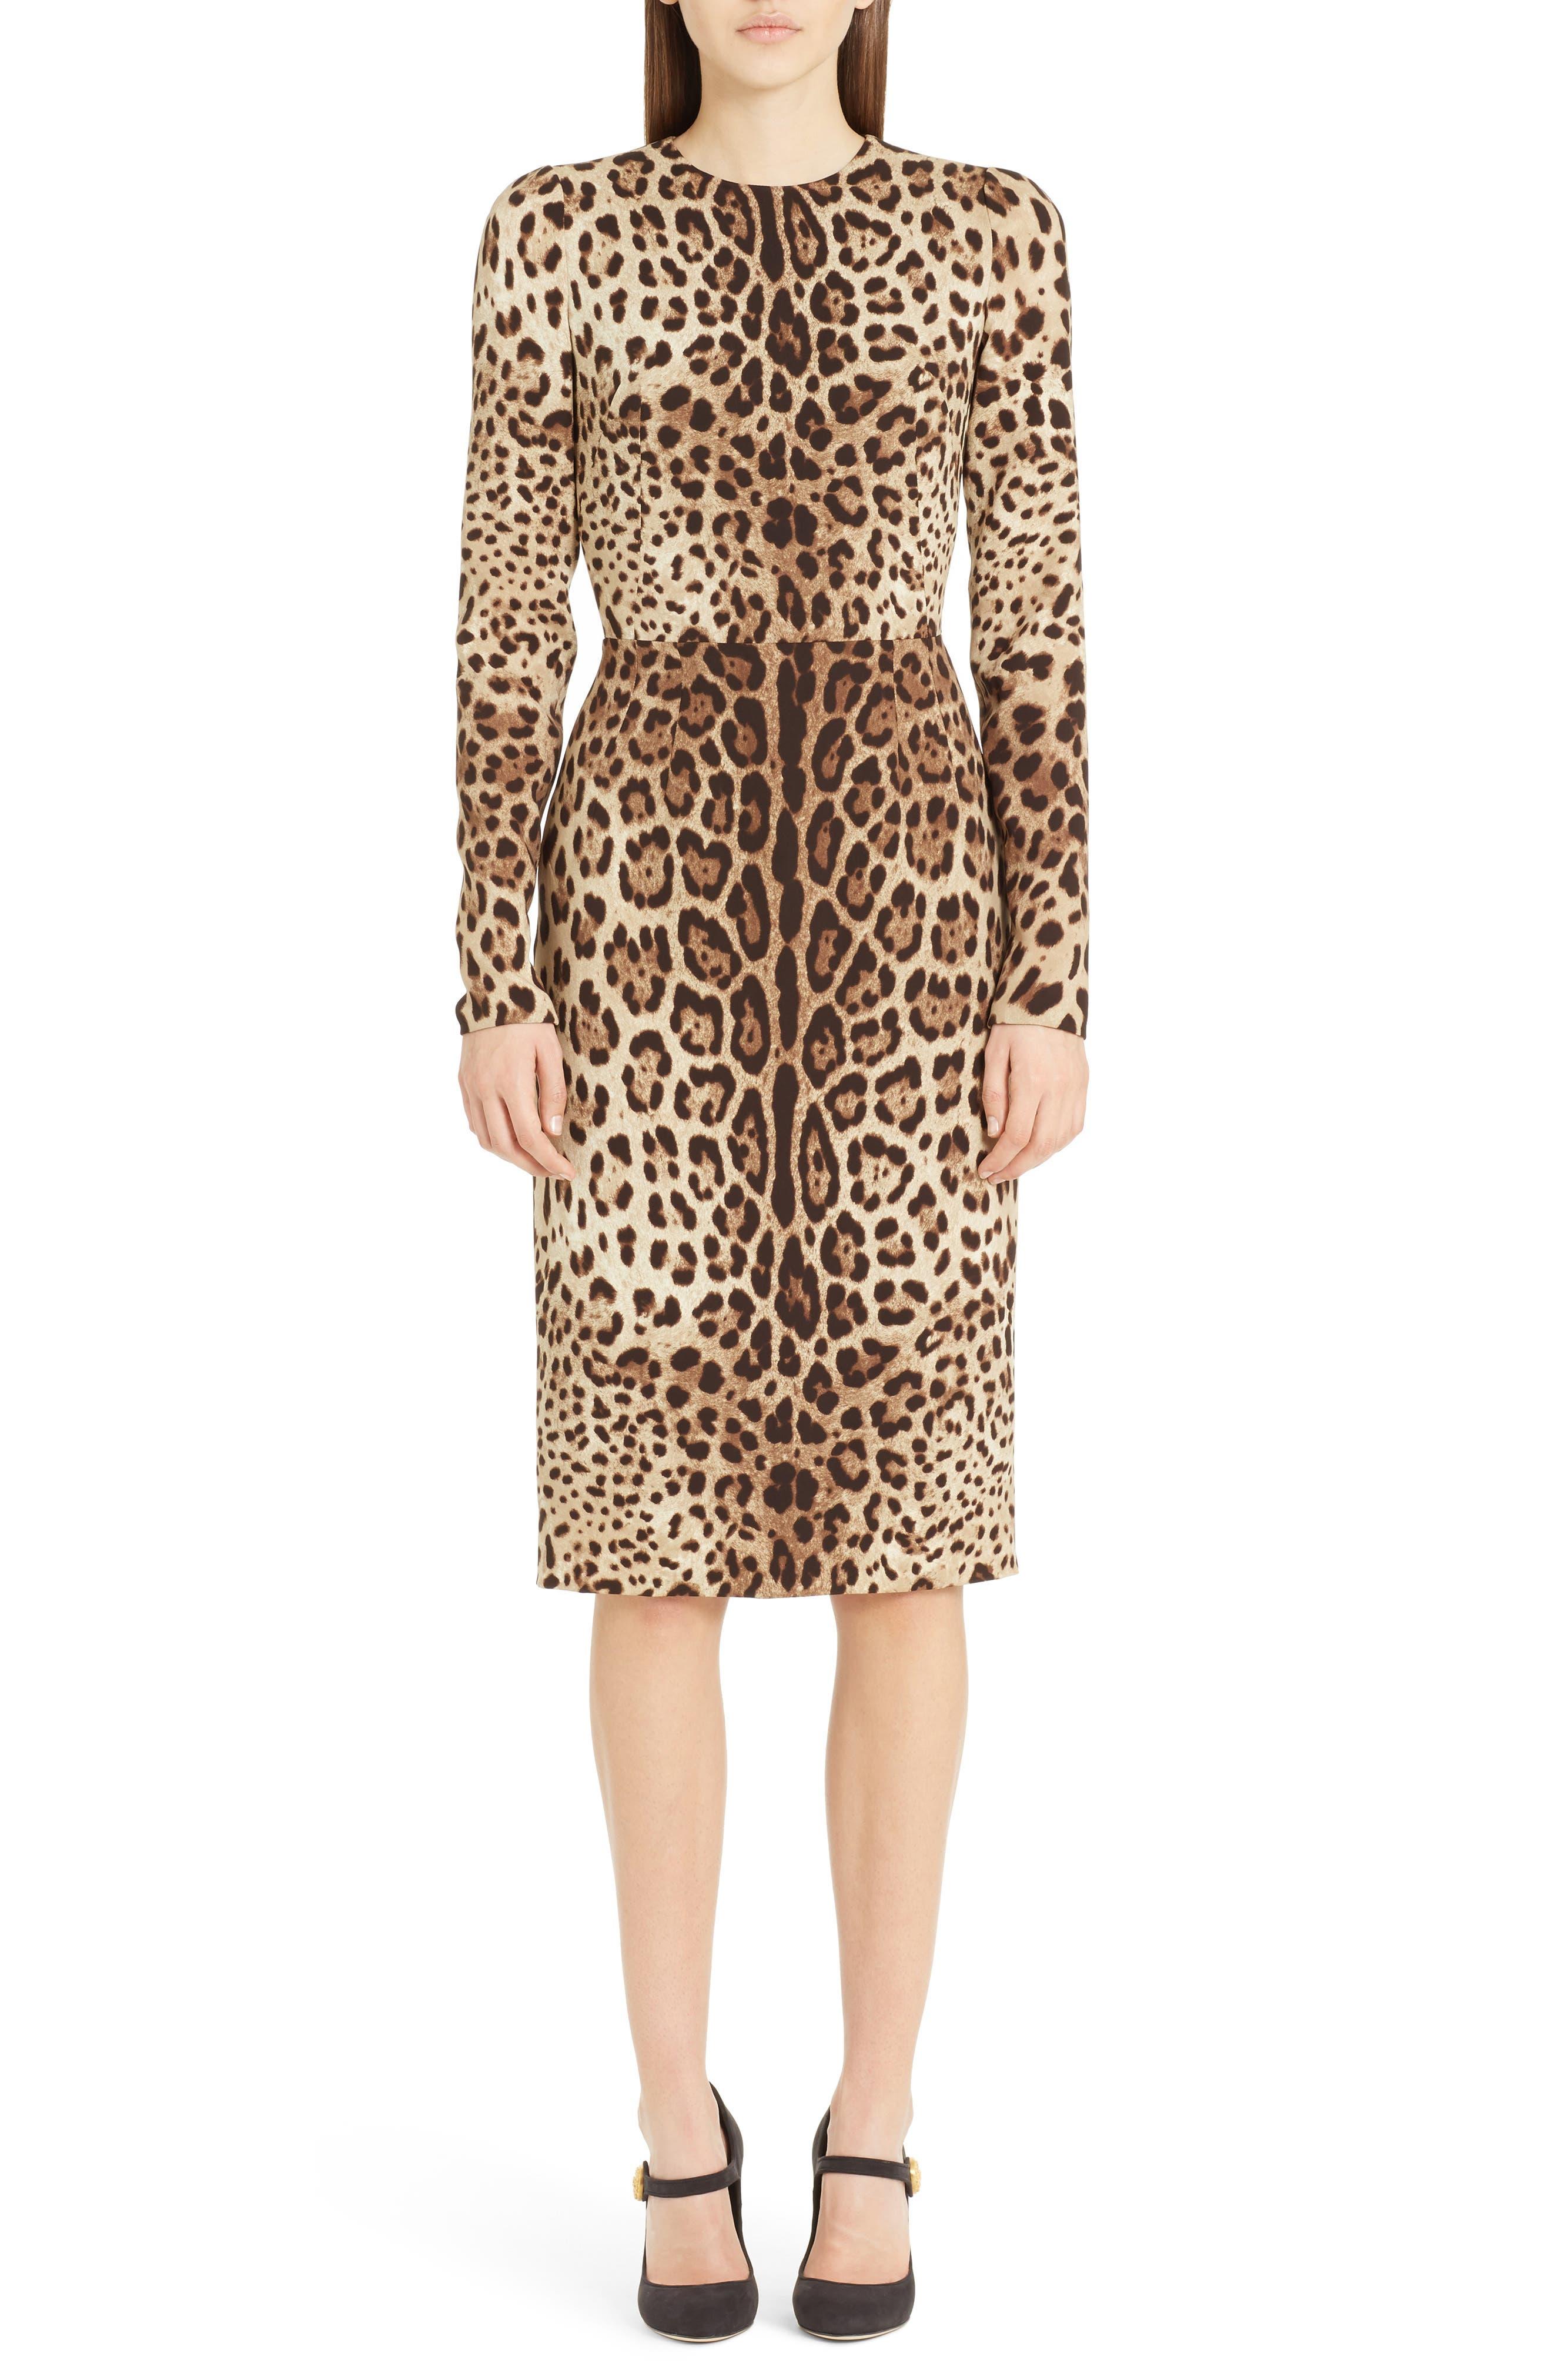 Dolce & gabbana Leopard Print Stretch Silk Sheath Dress, US / 46 IT - Brown